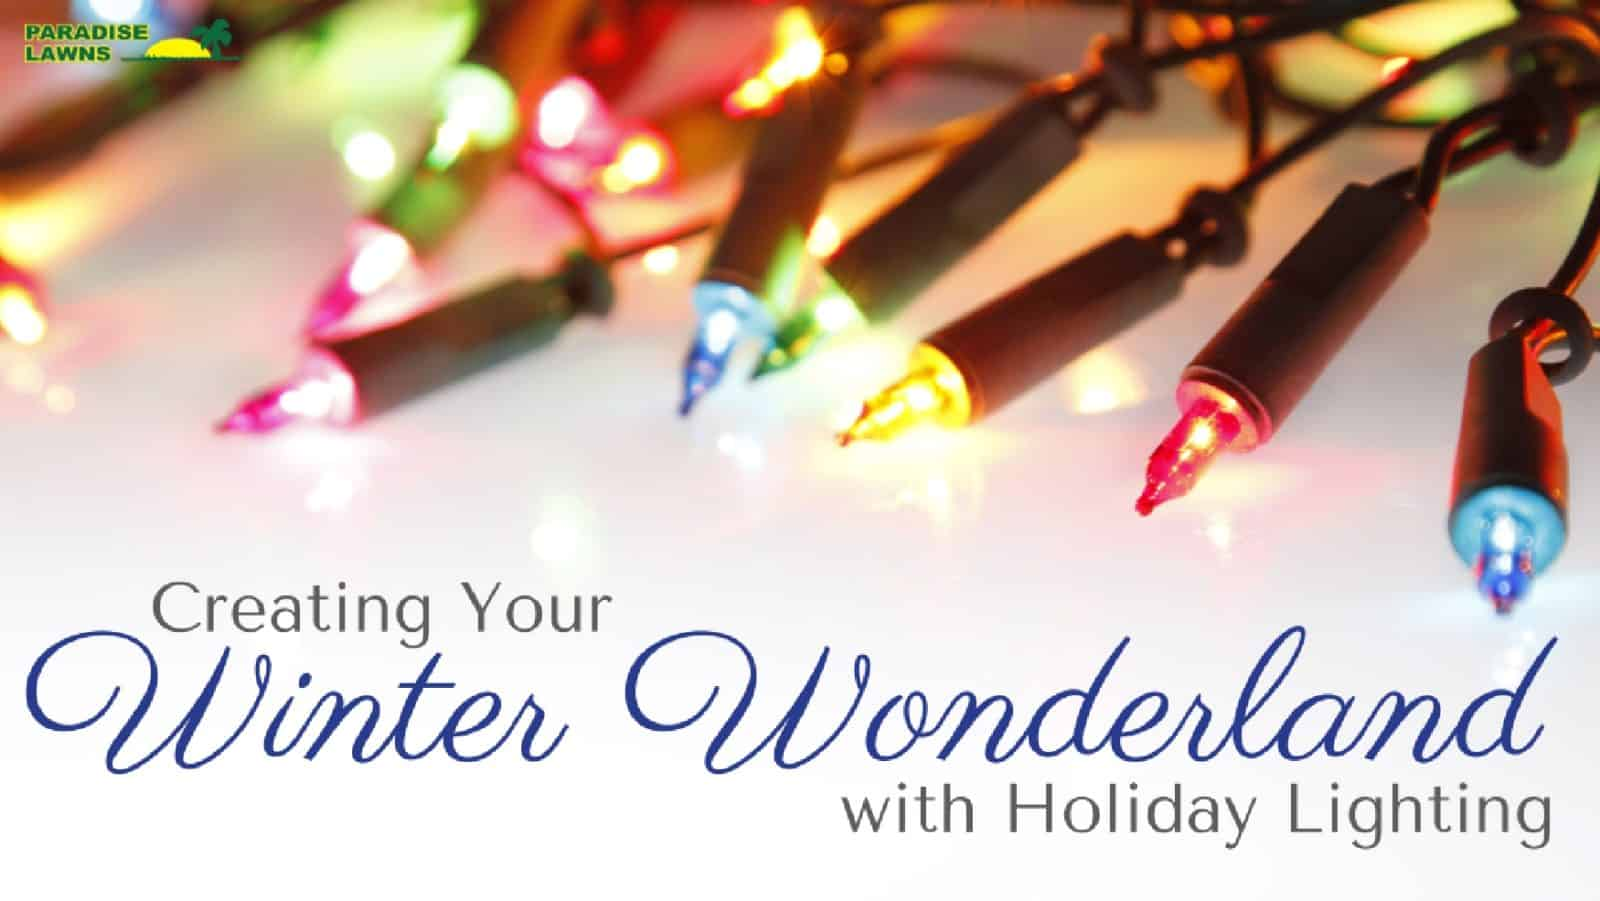 Creating Your Winter Wonderland